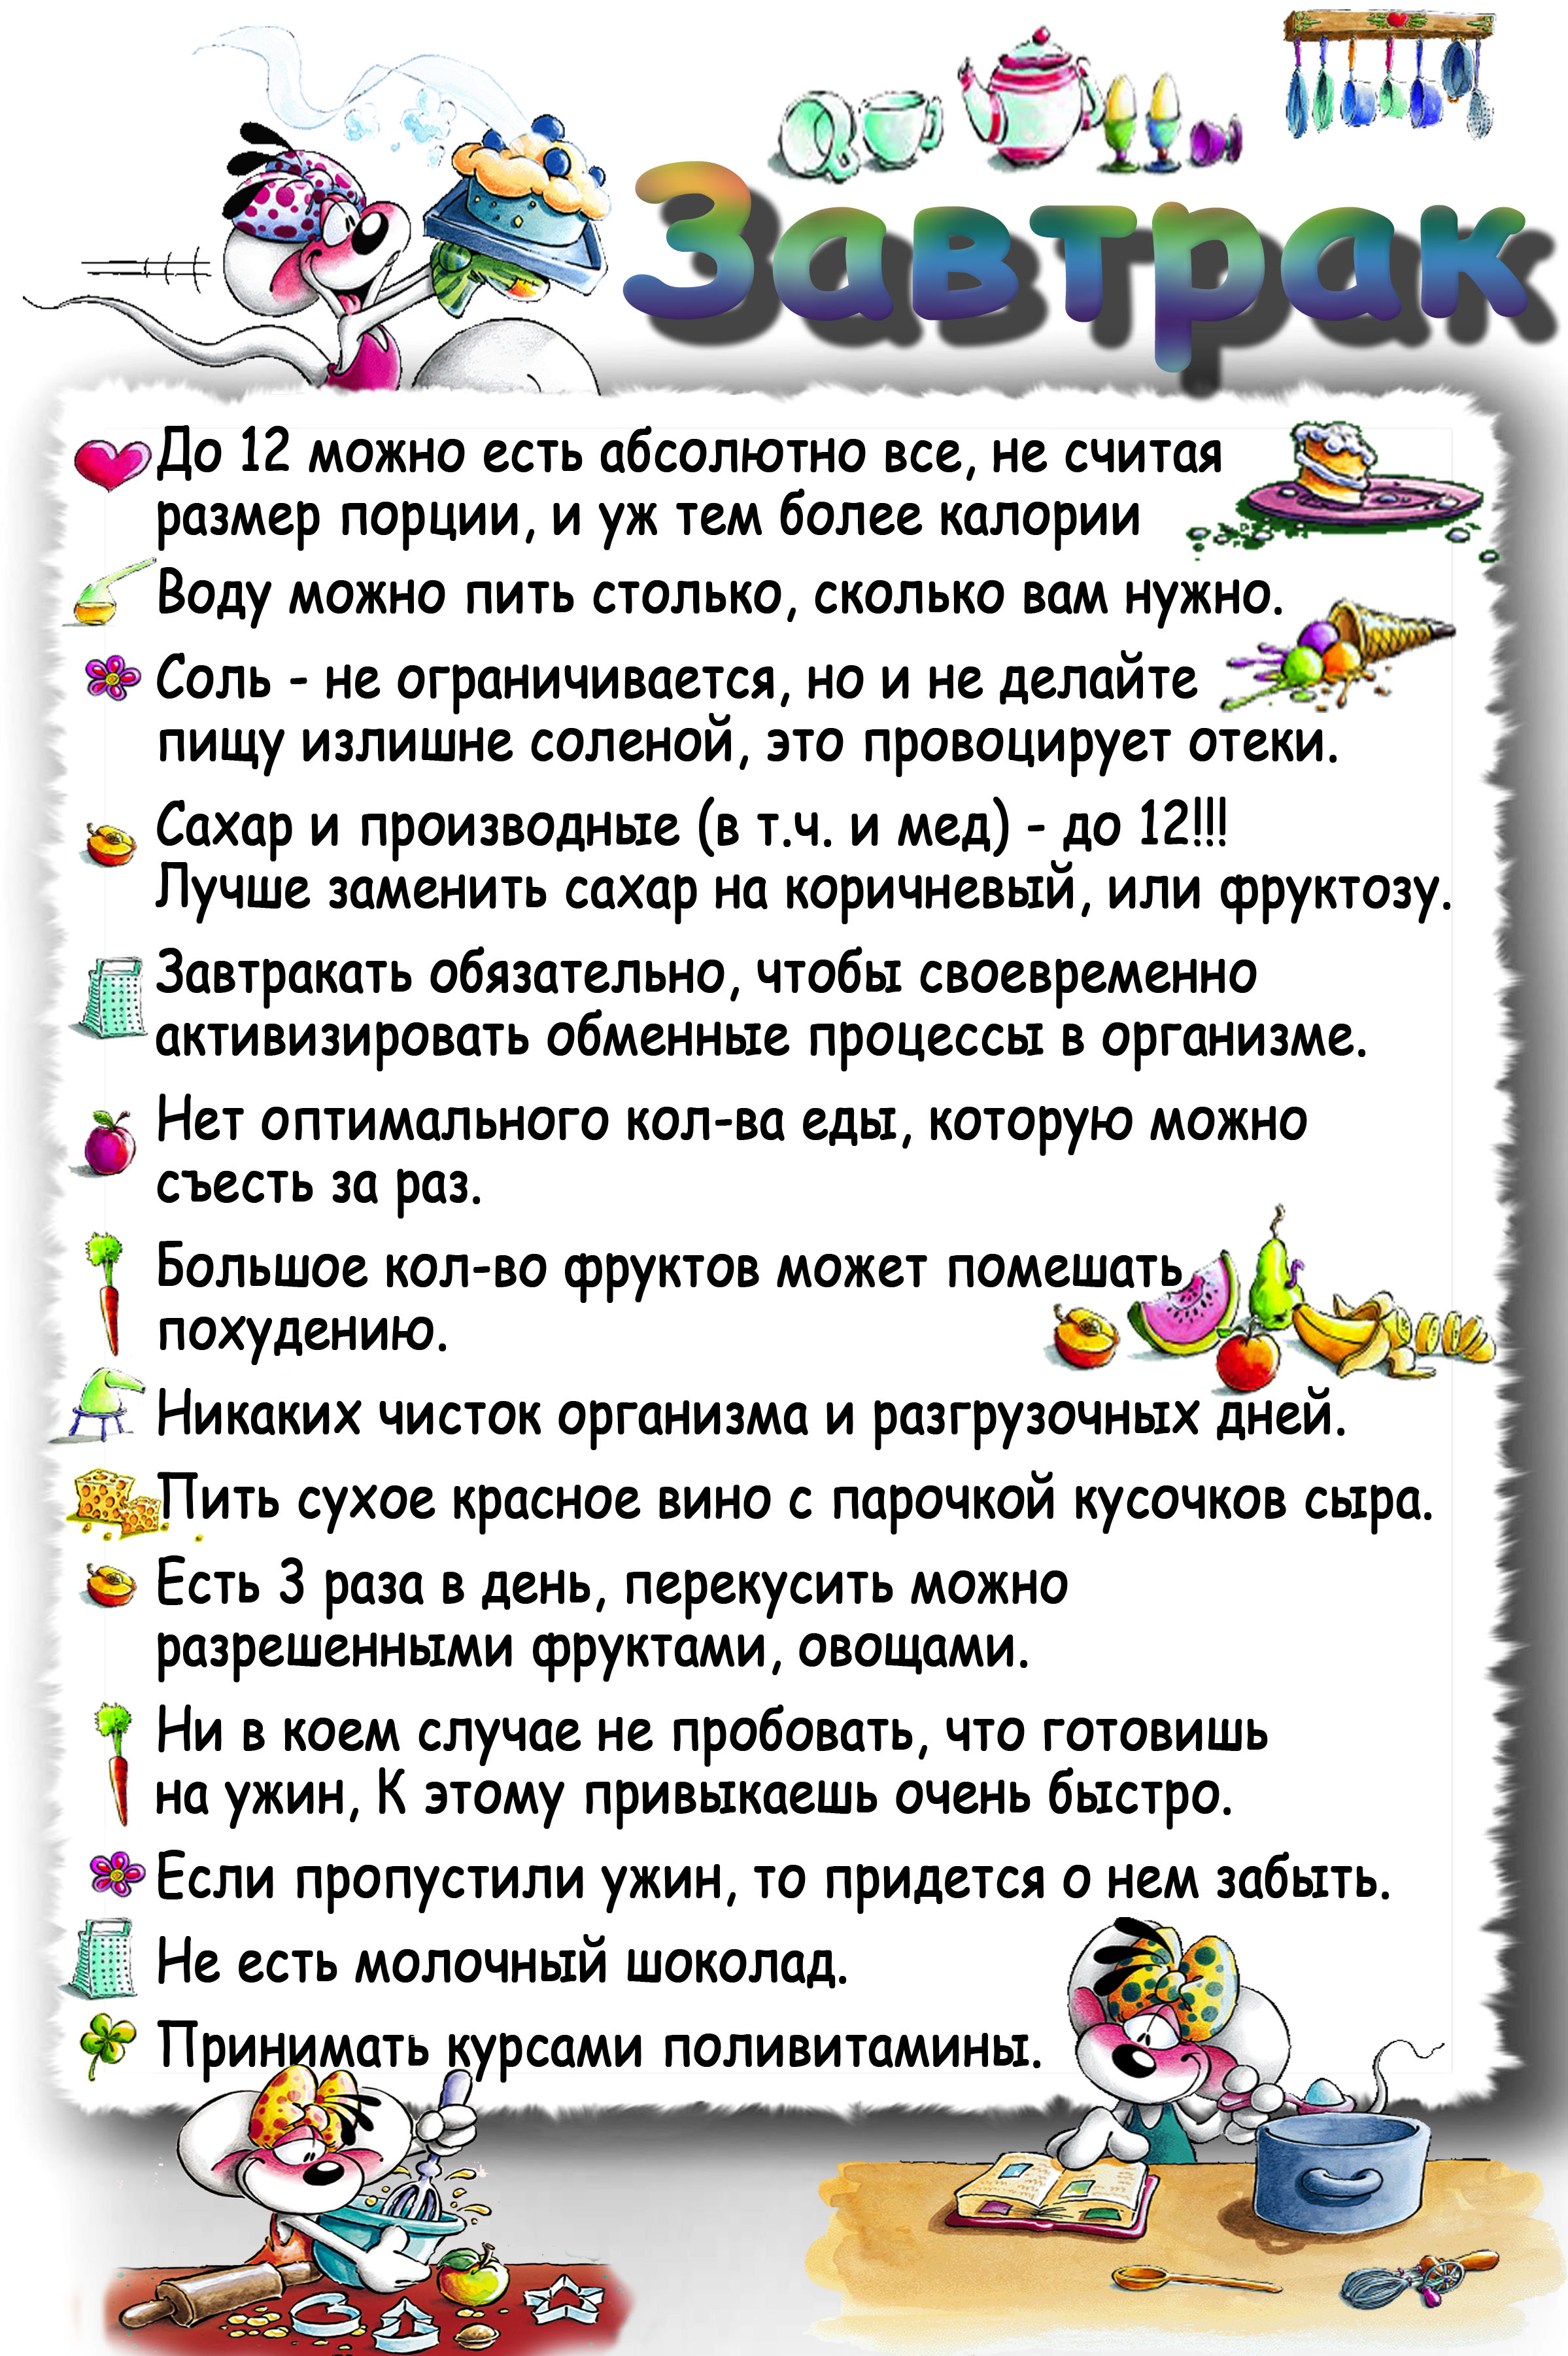 http://forum.materinstvo.ru/uploads/1222085913//post-39916-1222261993.jpg